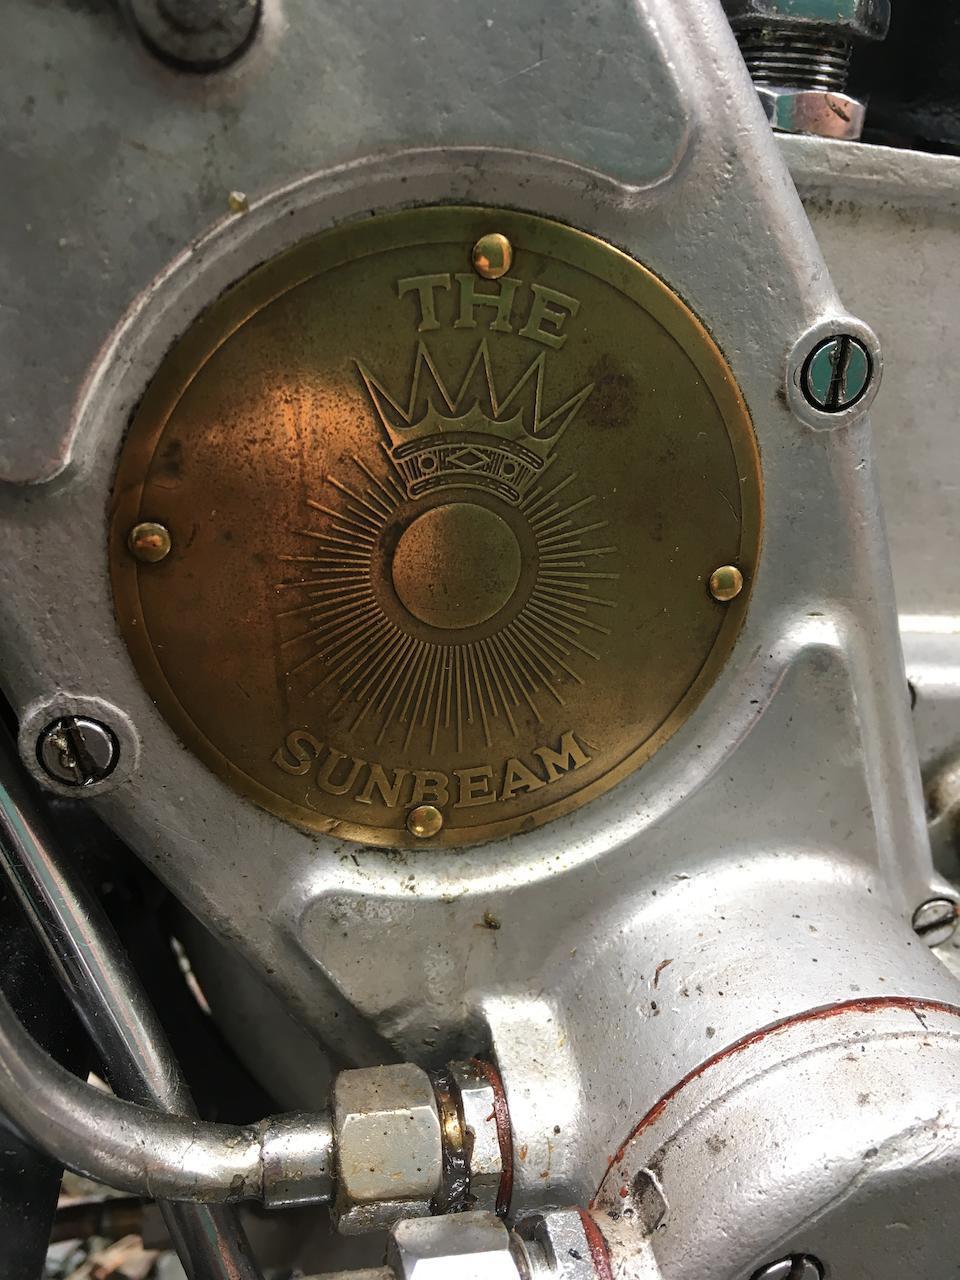 1930 Sunbeam 493cc Model 9 Frame no. LL 4242 (over-stamped) Engine no. L4773